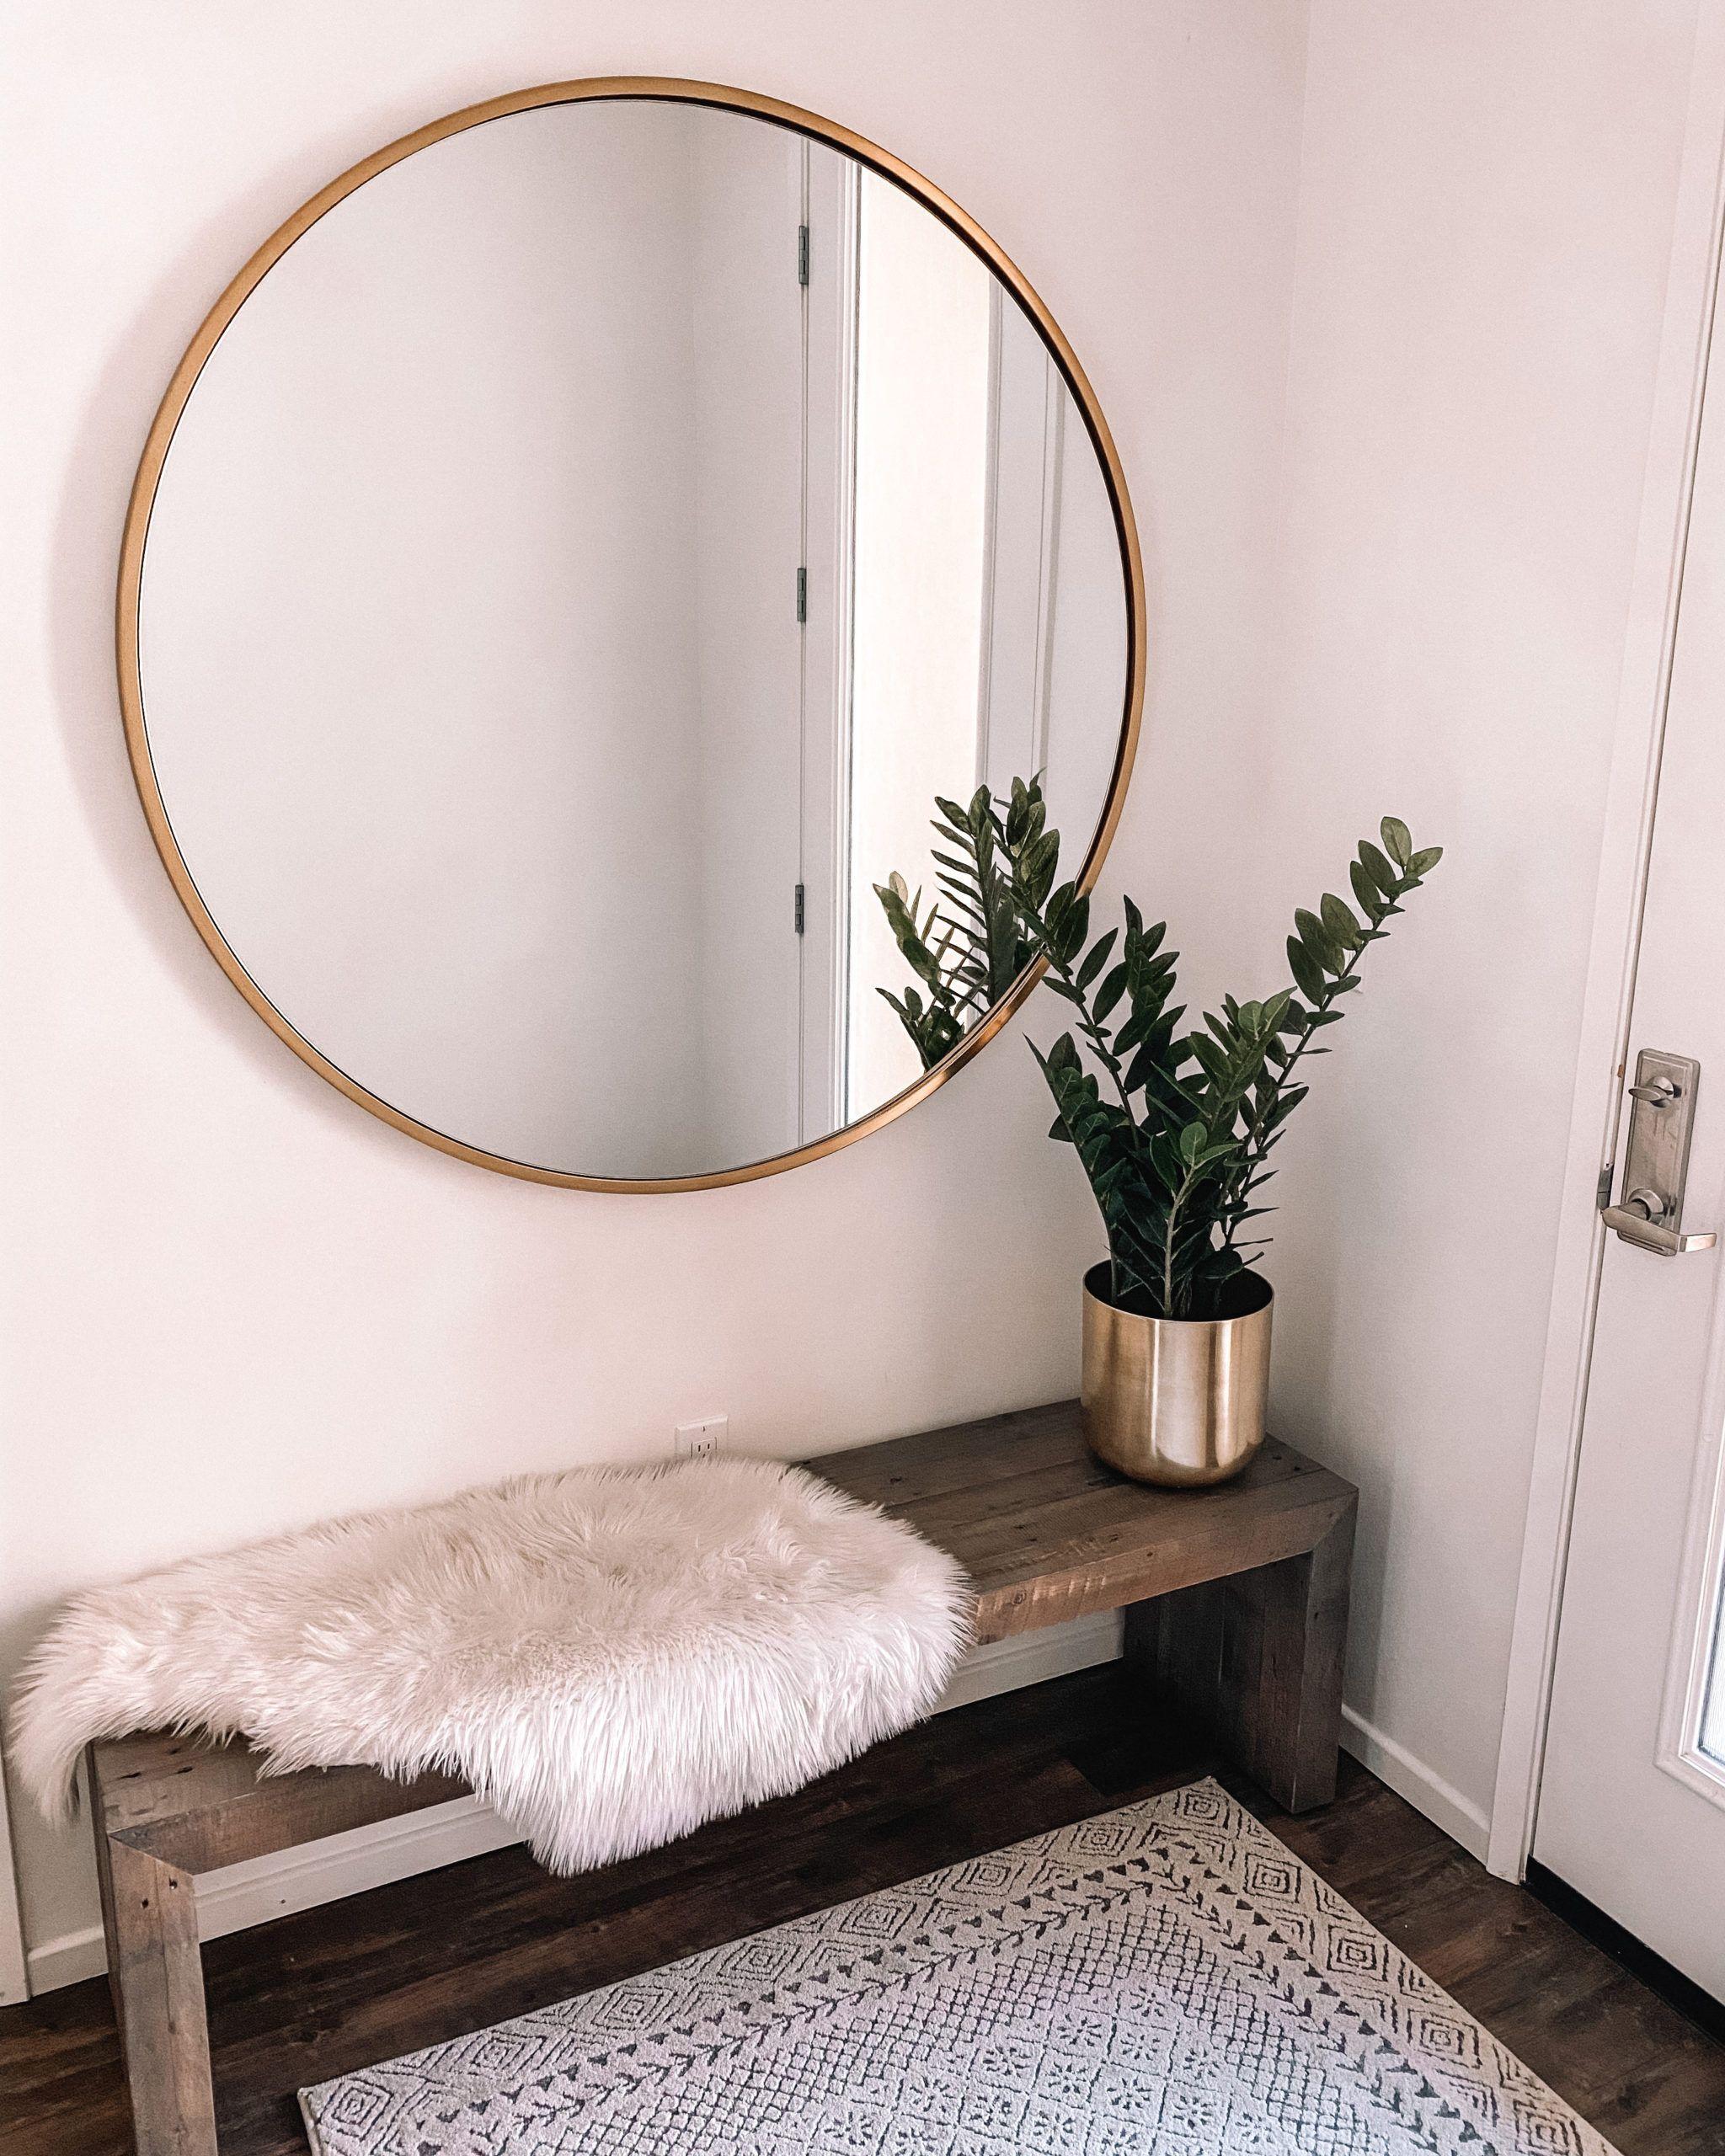 Pin On Home Decor In 2020 Decor Entryway Decor Small Home